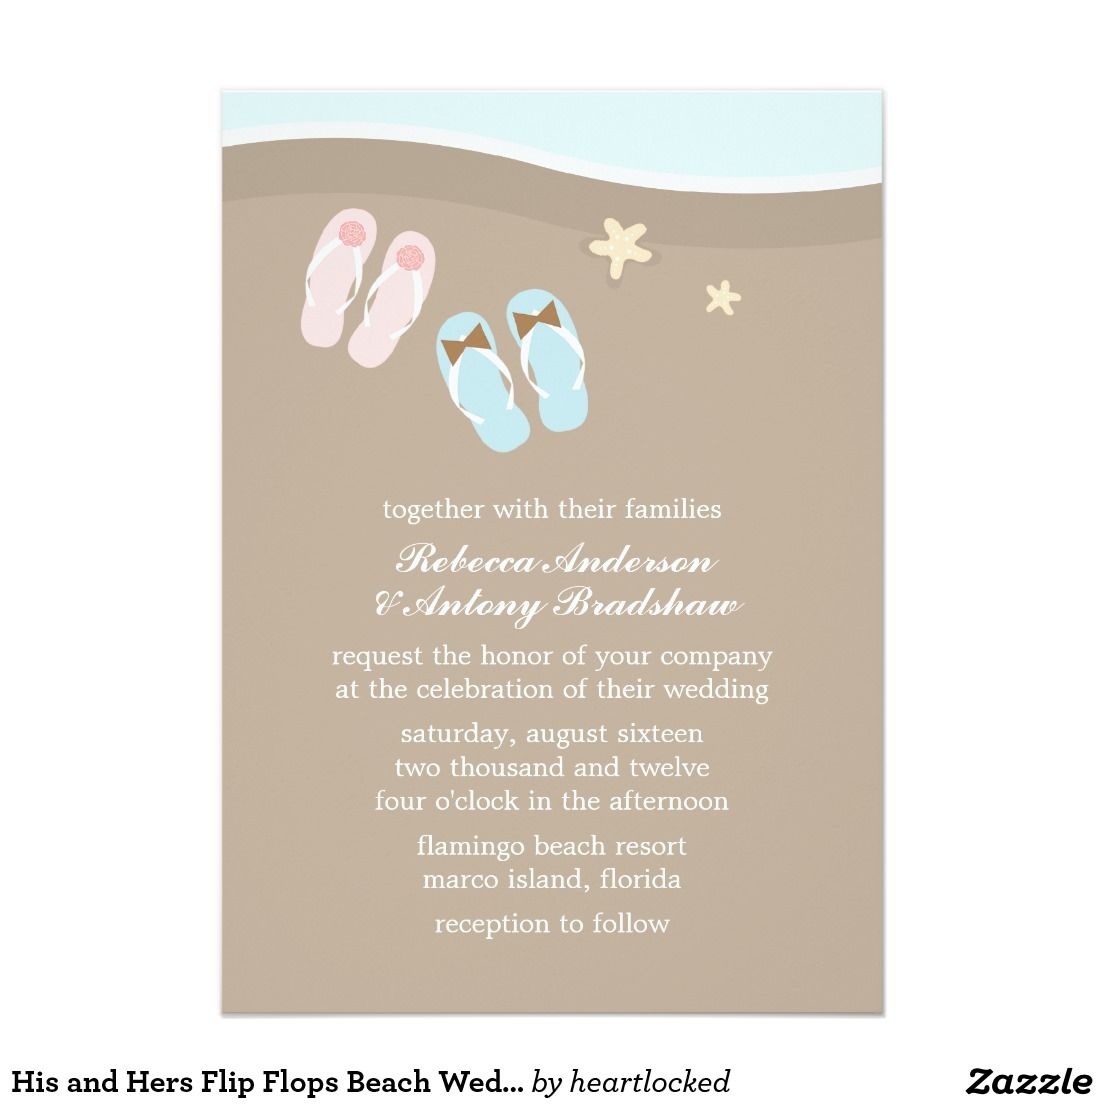 His and Hers Flip Flops Beach Wedding Card | Beach weddings, Wedding ...